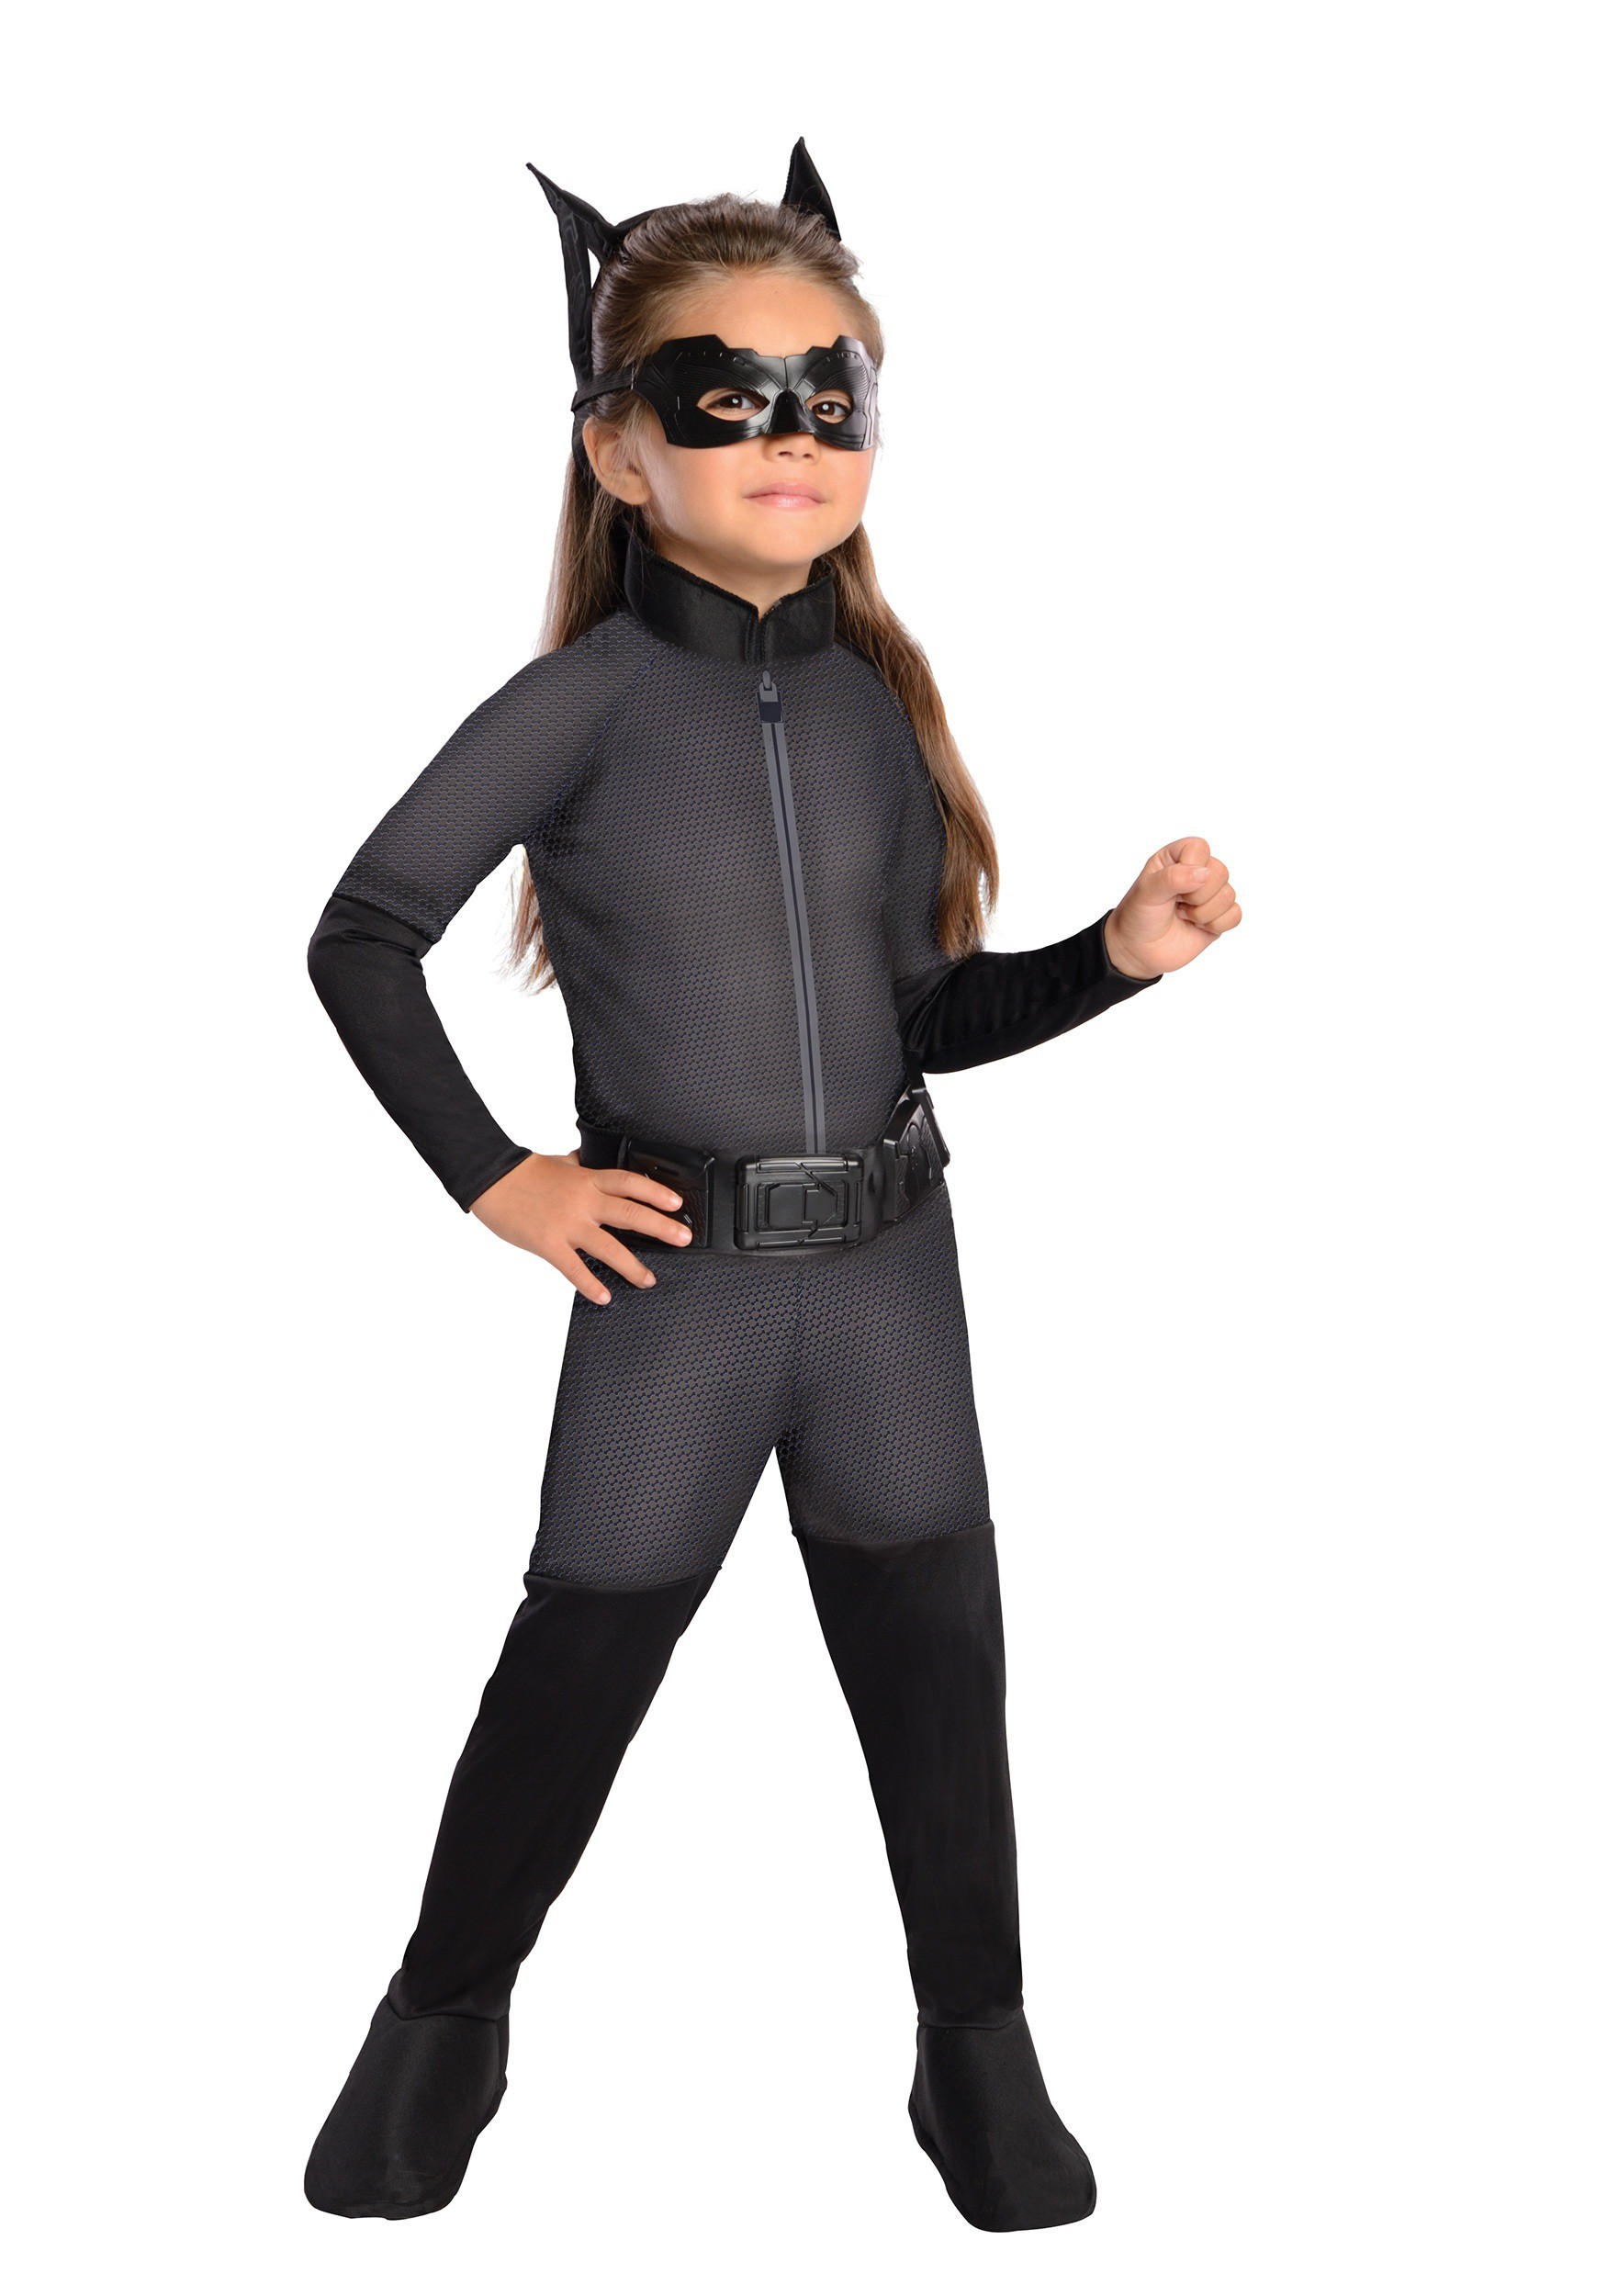 sc 1 st  Fun.com & Toddler Catwoman Romper Costume